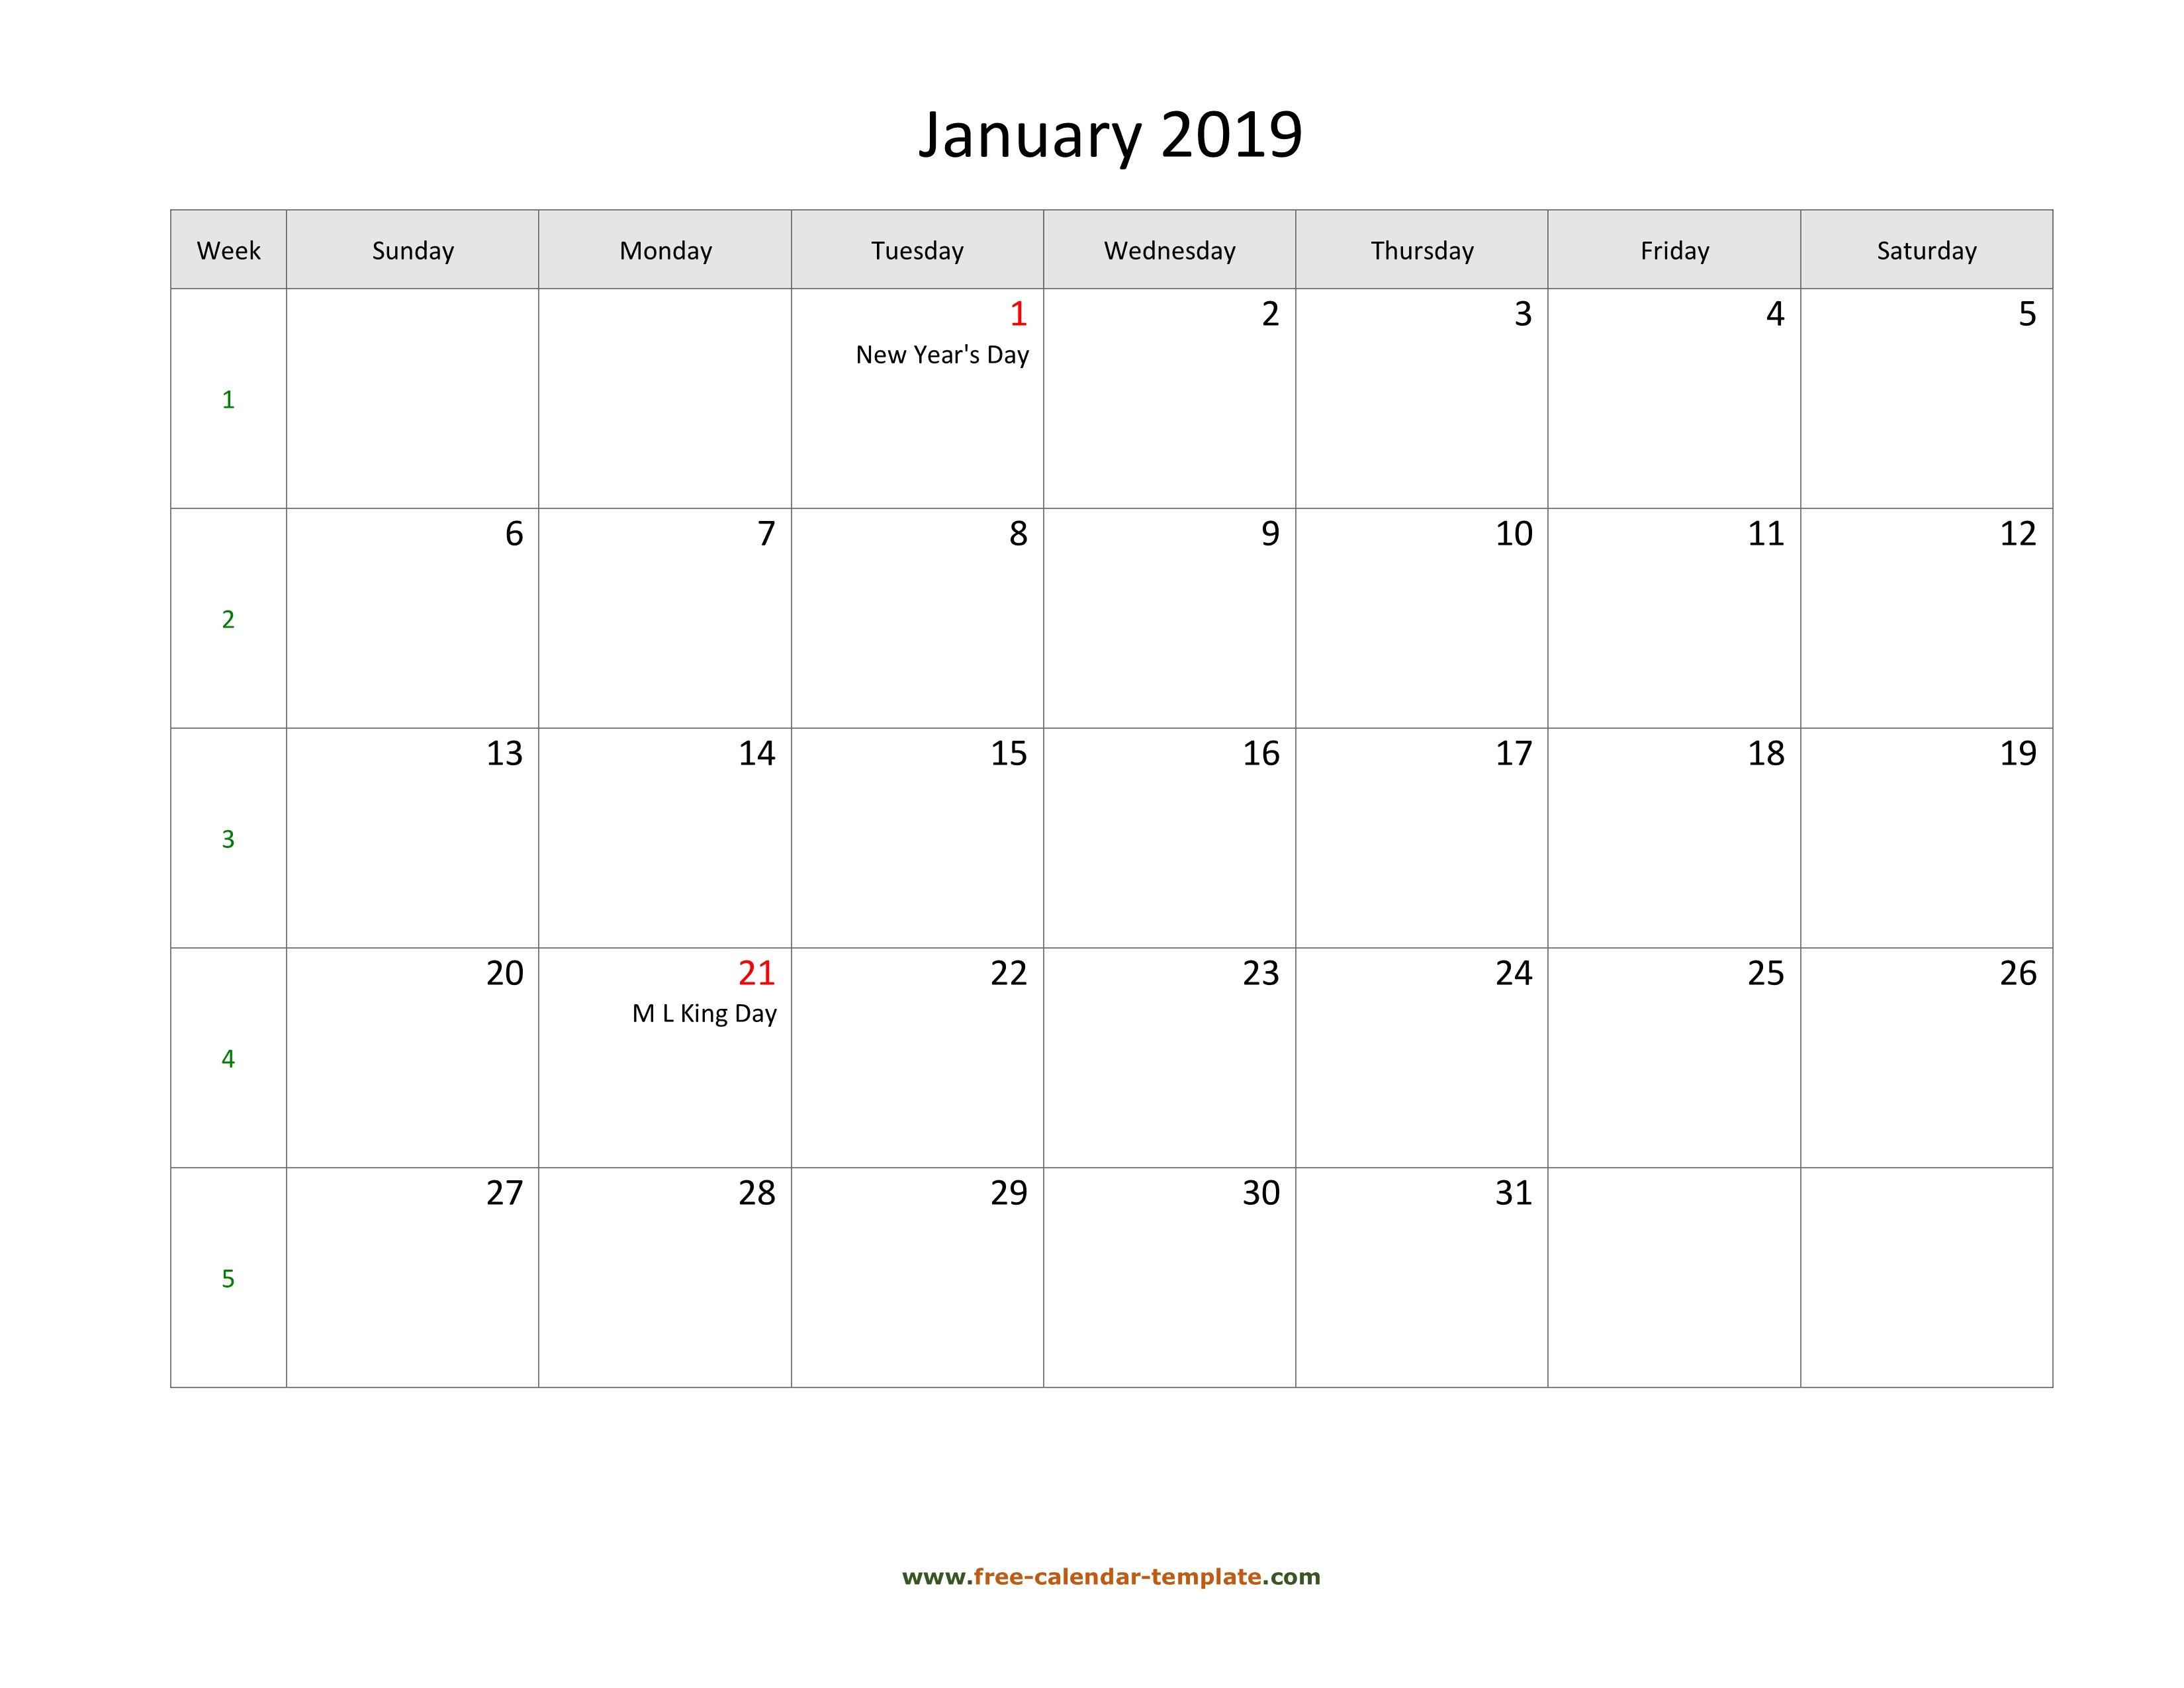 Free 2019 Calendar Blank January Template (Horizontal) | Free Calendar 2019 January Pdf